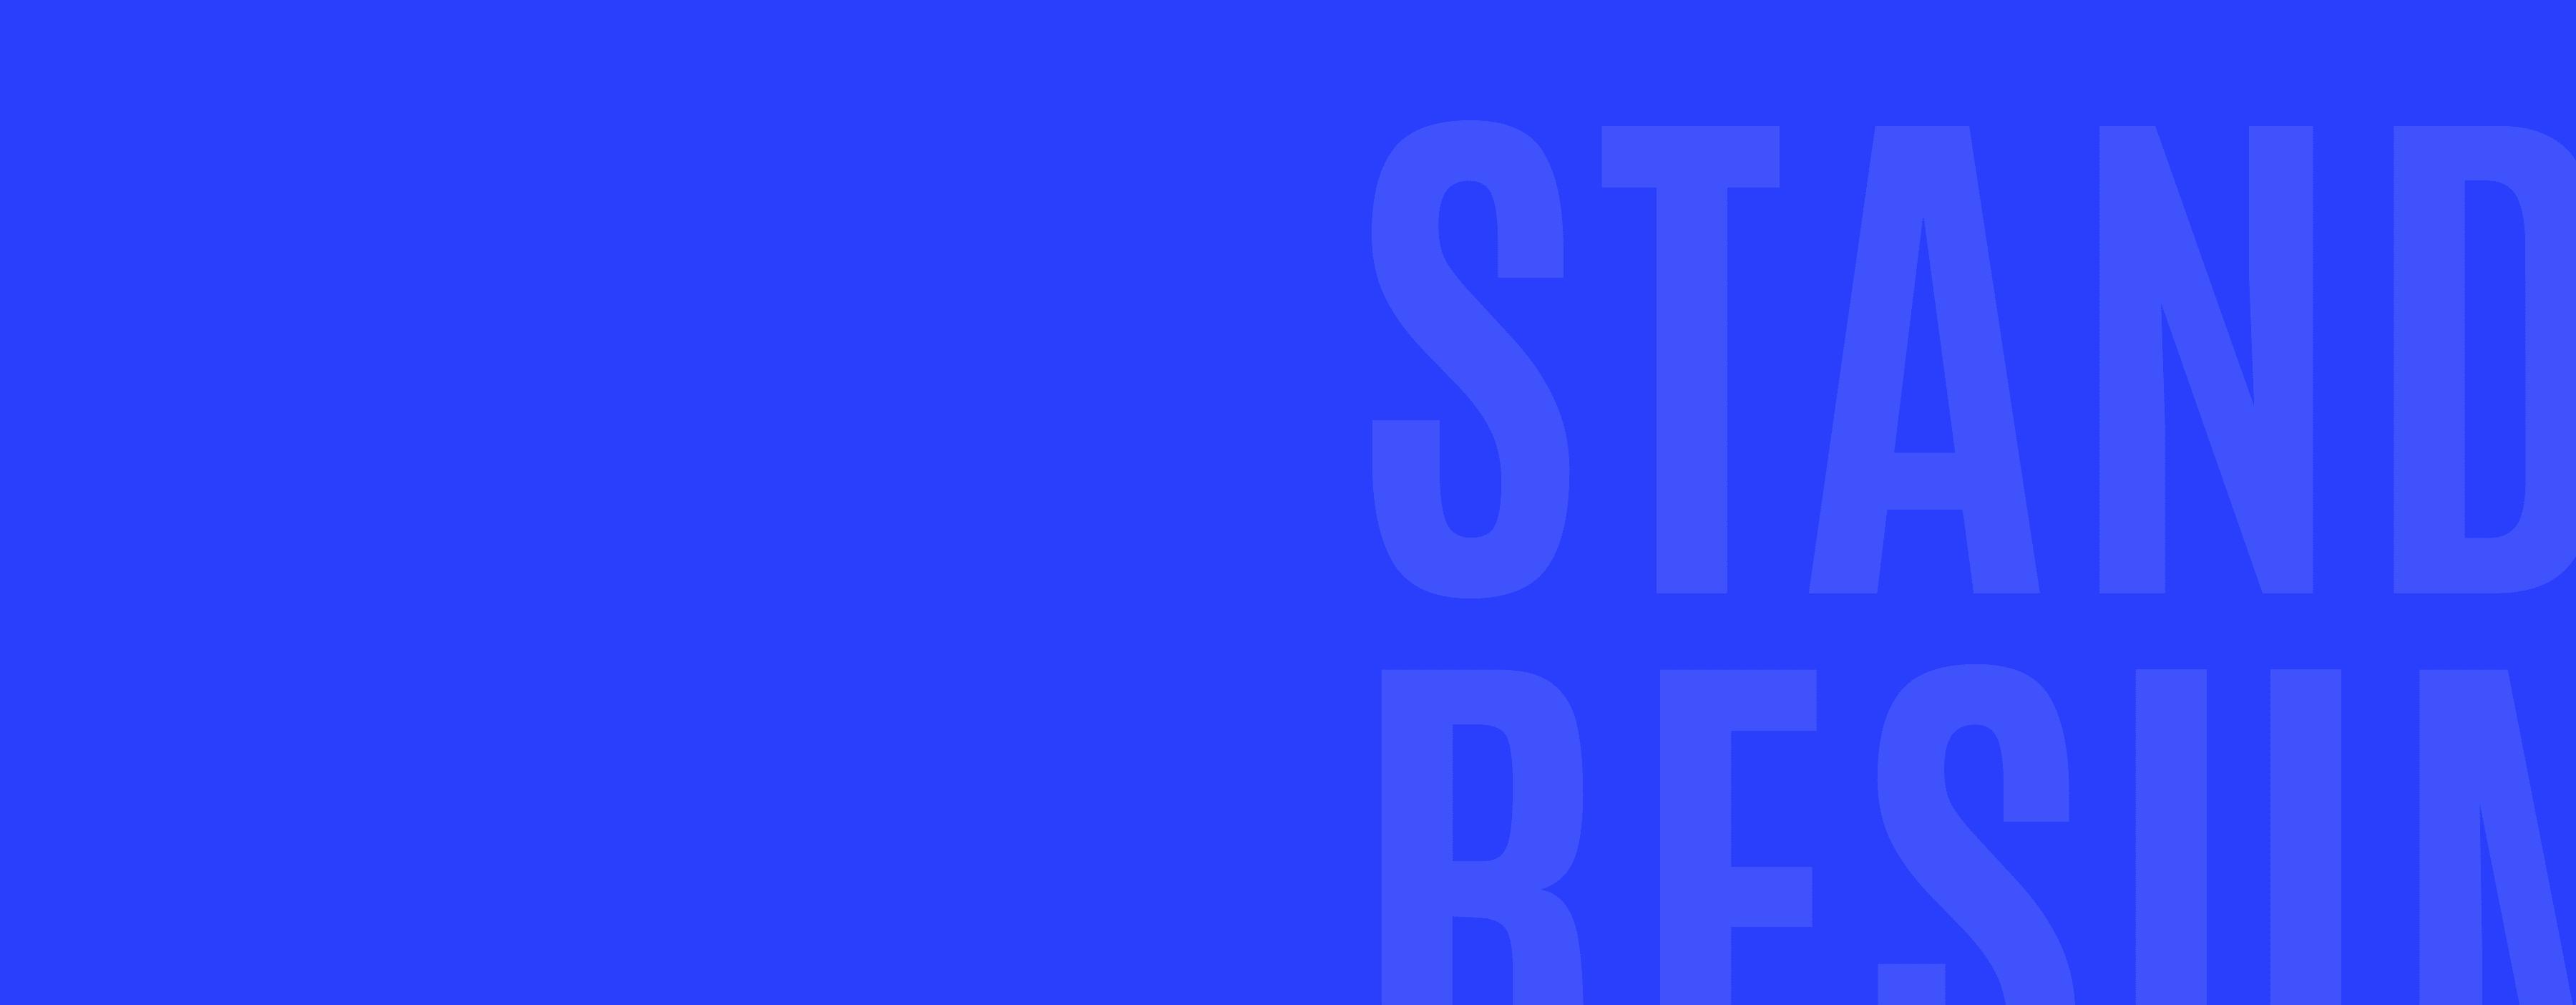 The Standard Resume logo